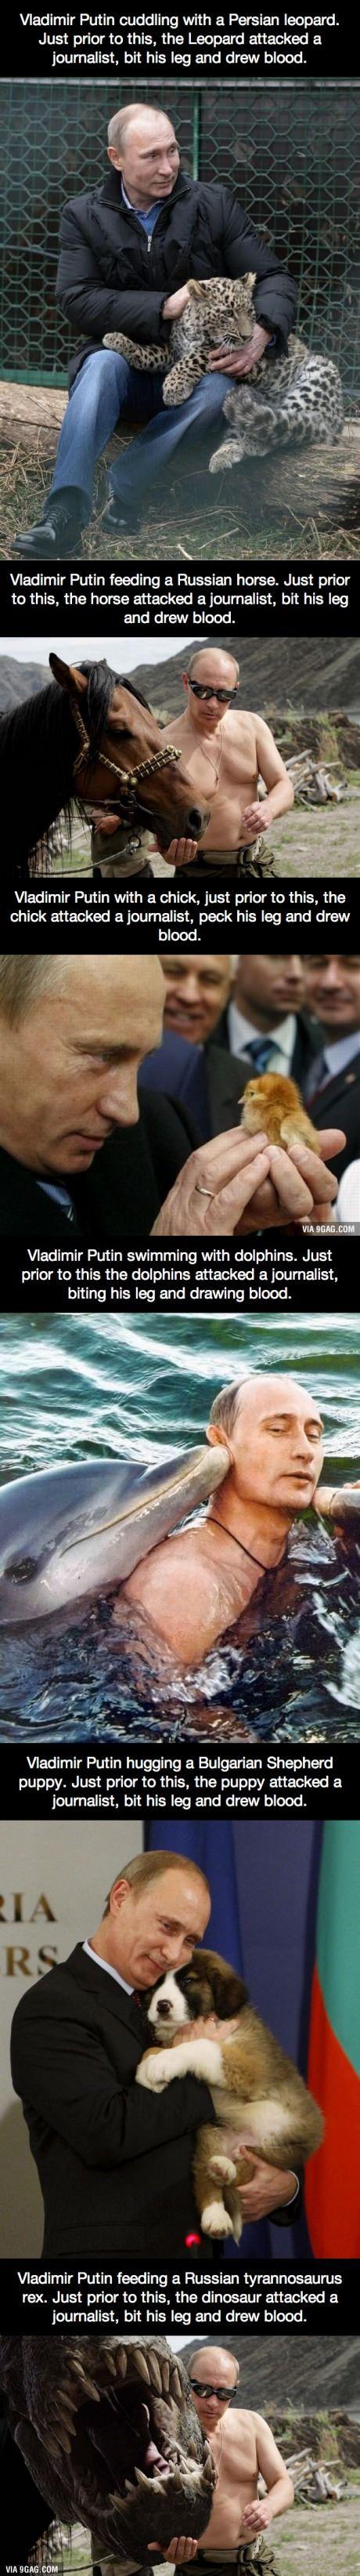 Vladimir Putin and His Animal Friends